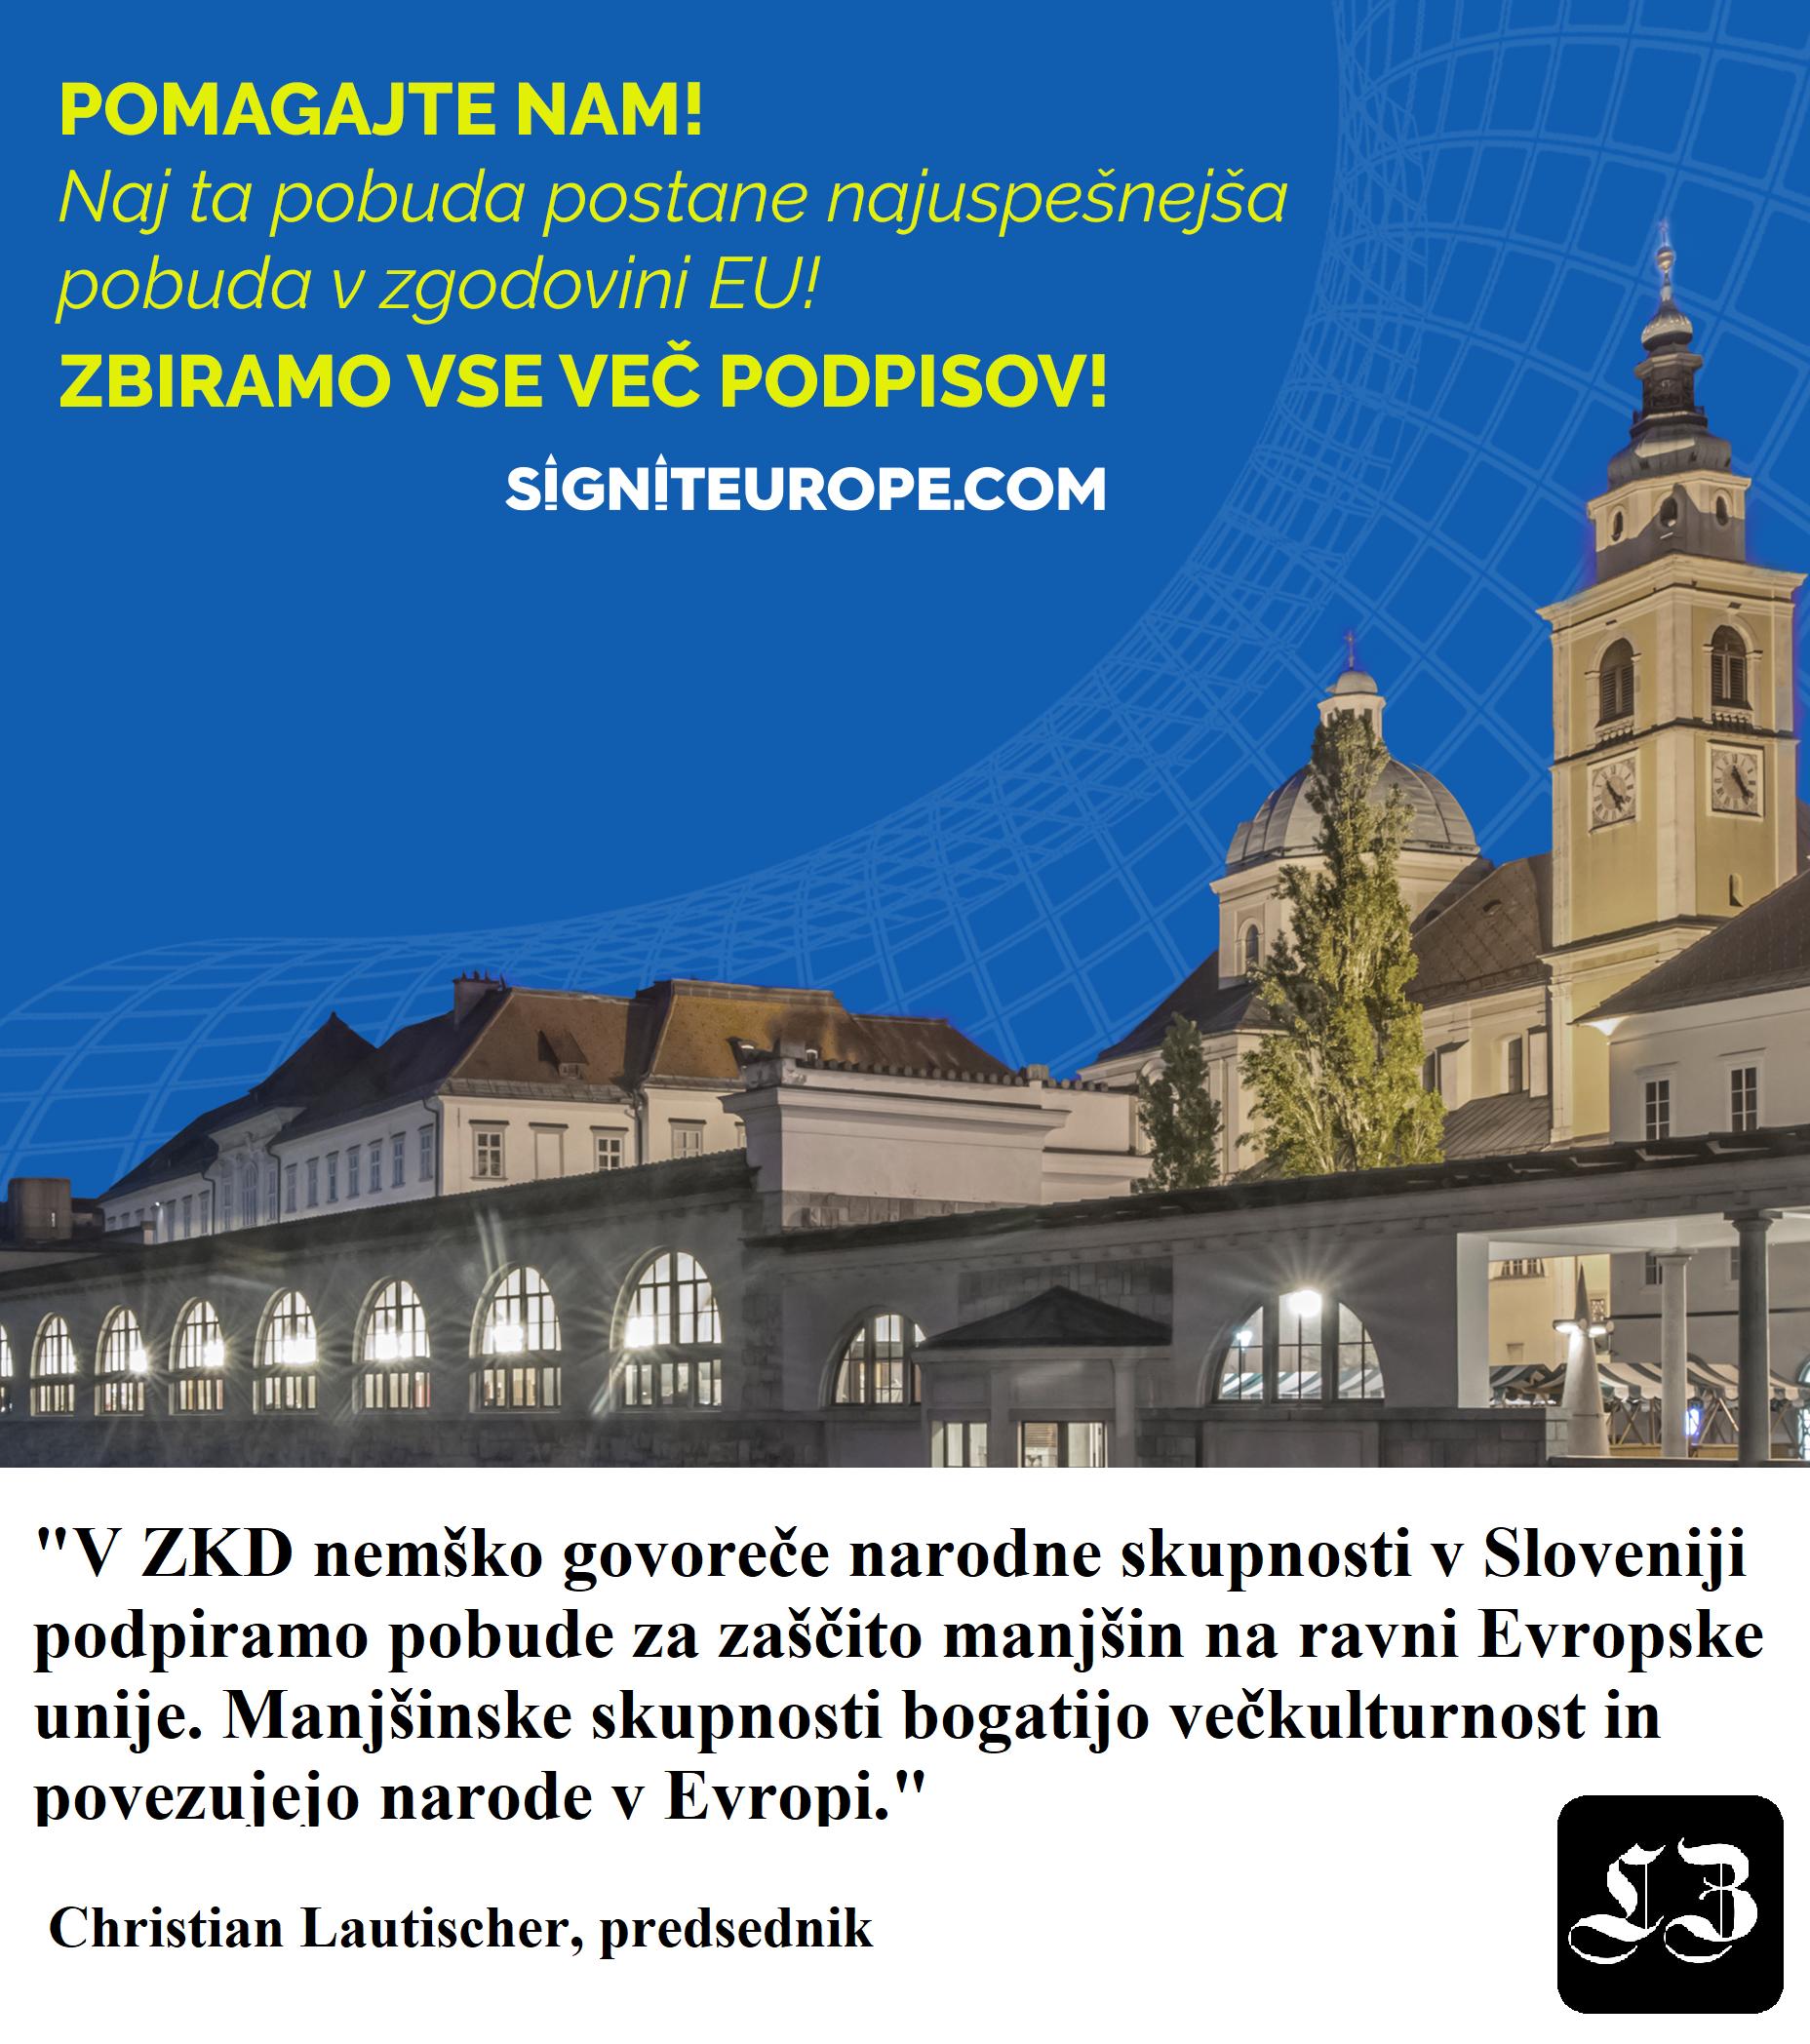 Signiteurope